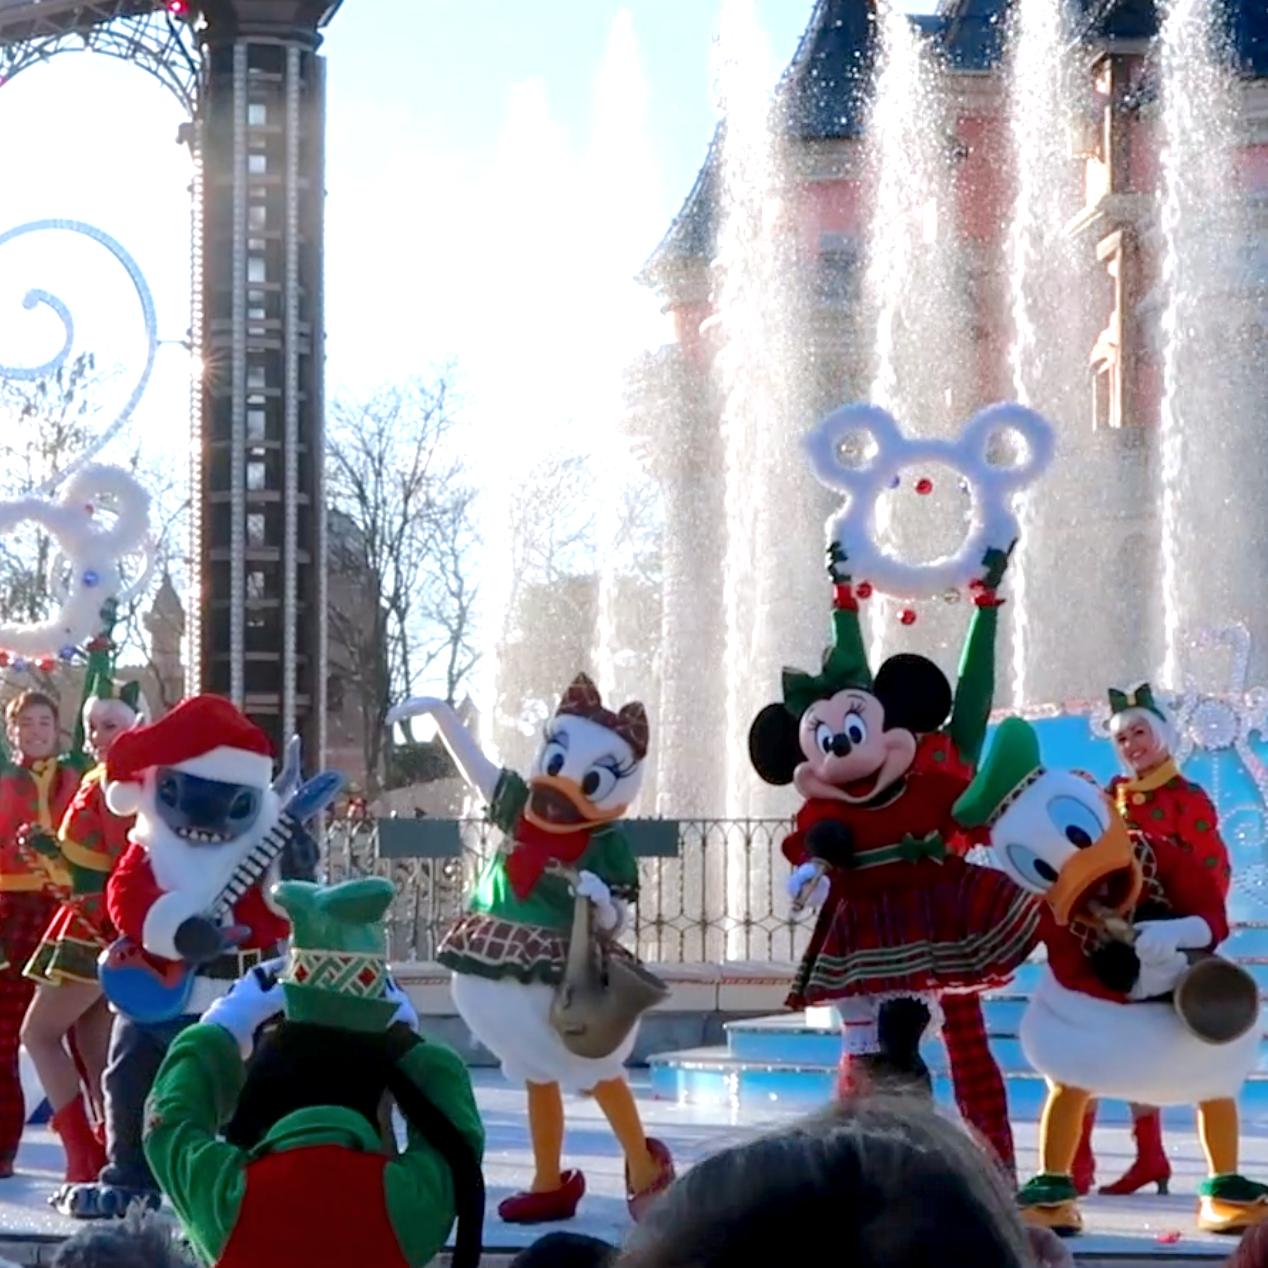 Renabelle: Disneyland Paris Christmas 2017 Day 3 Blogmas Day 18